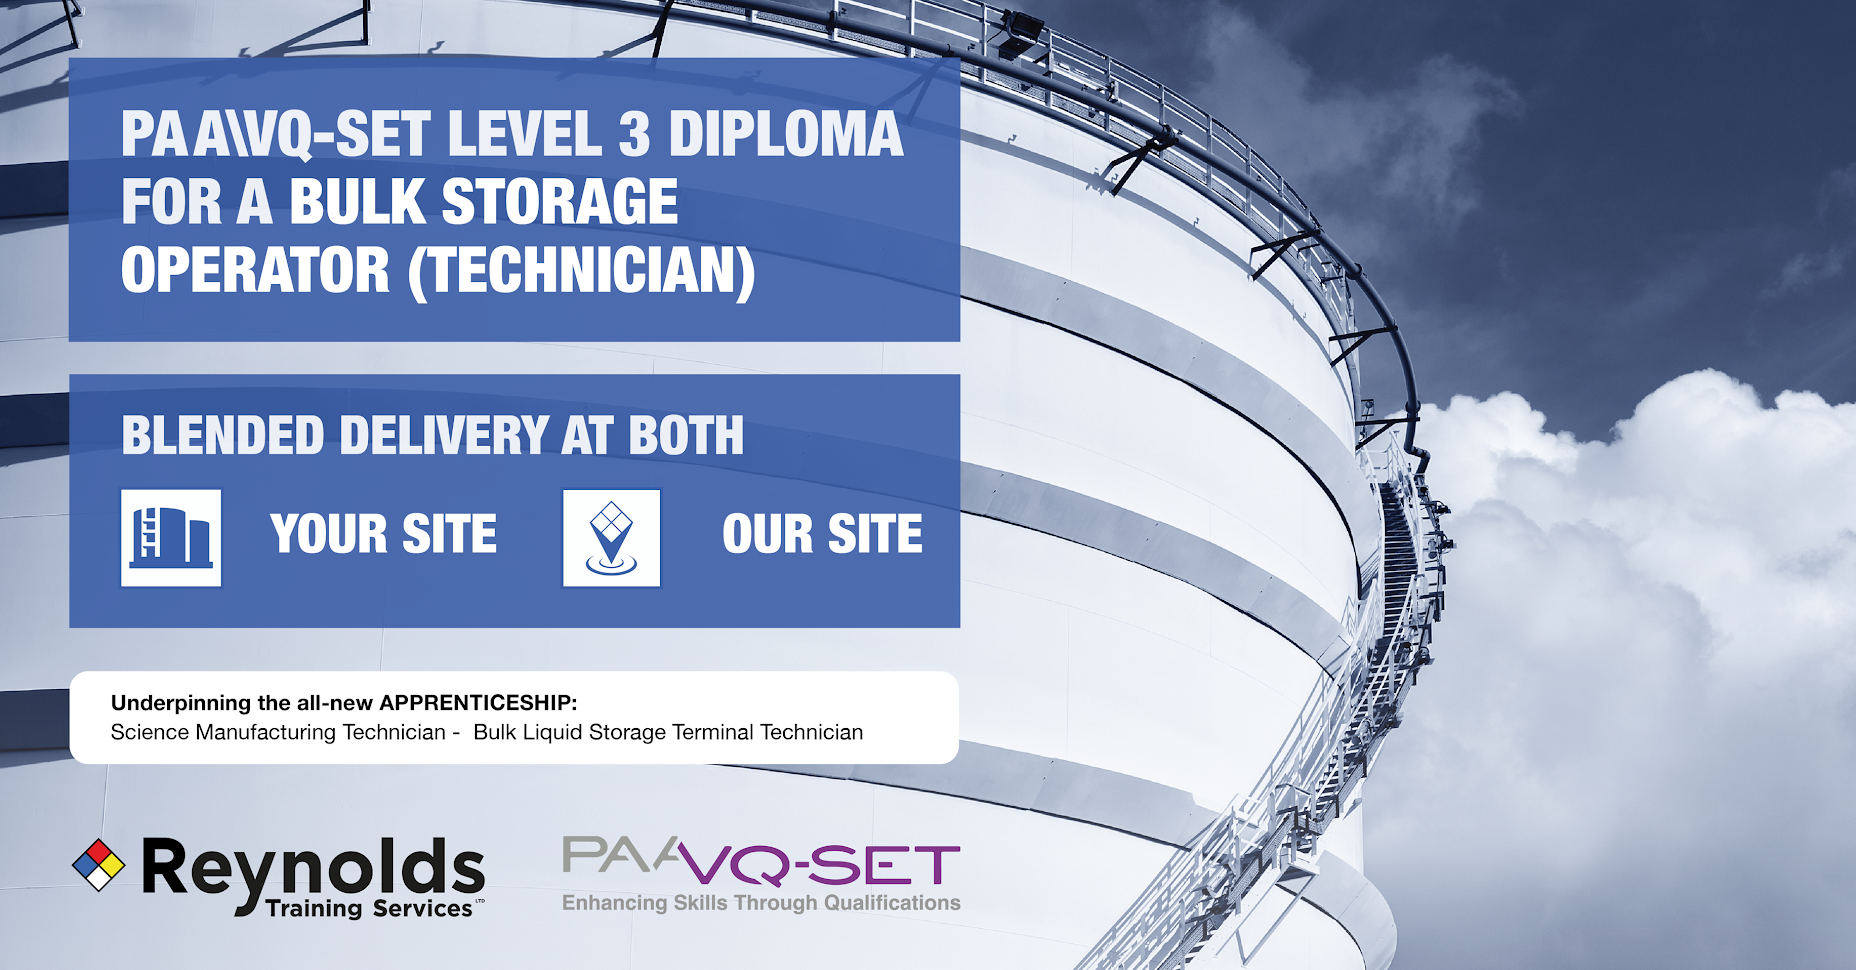 PAA\VQ-SET Level 3 Diploma for a Bulk Storage Operator (Technician)